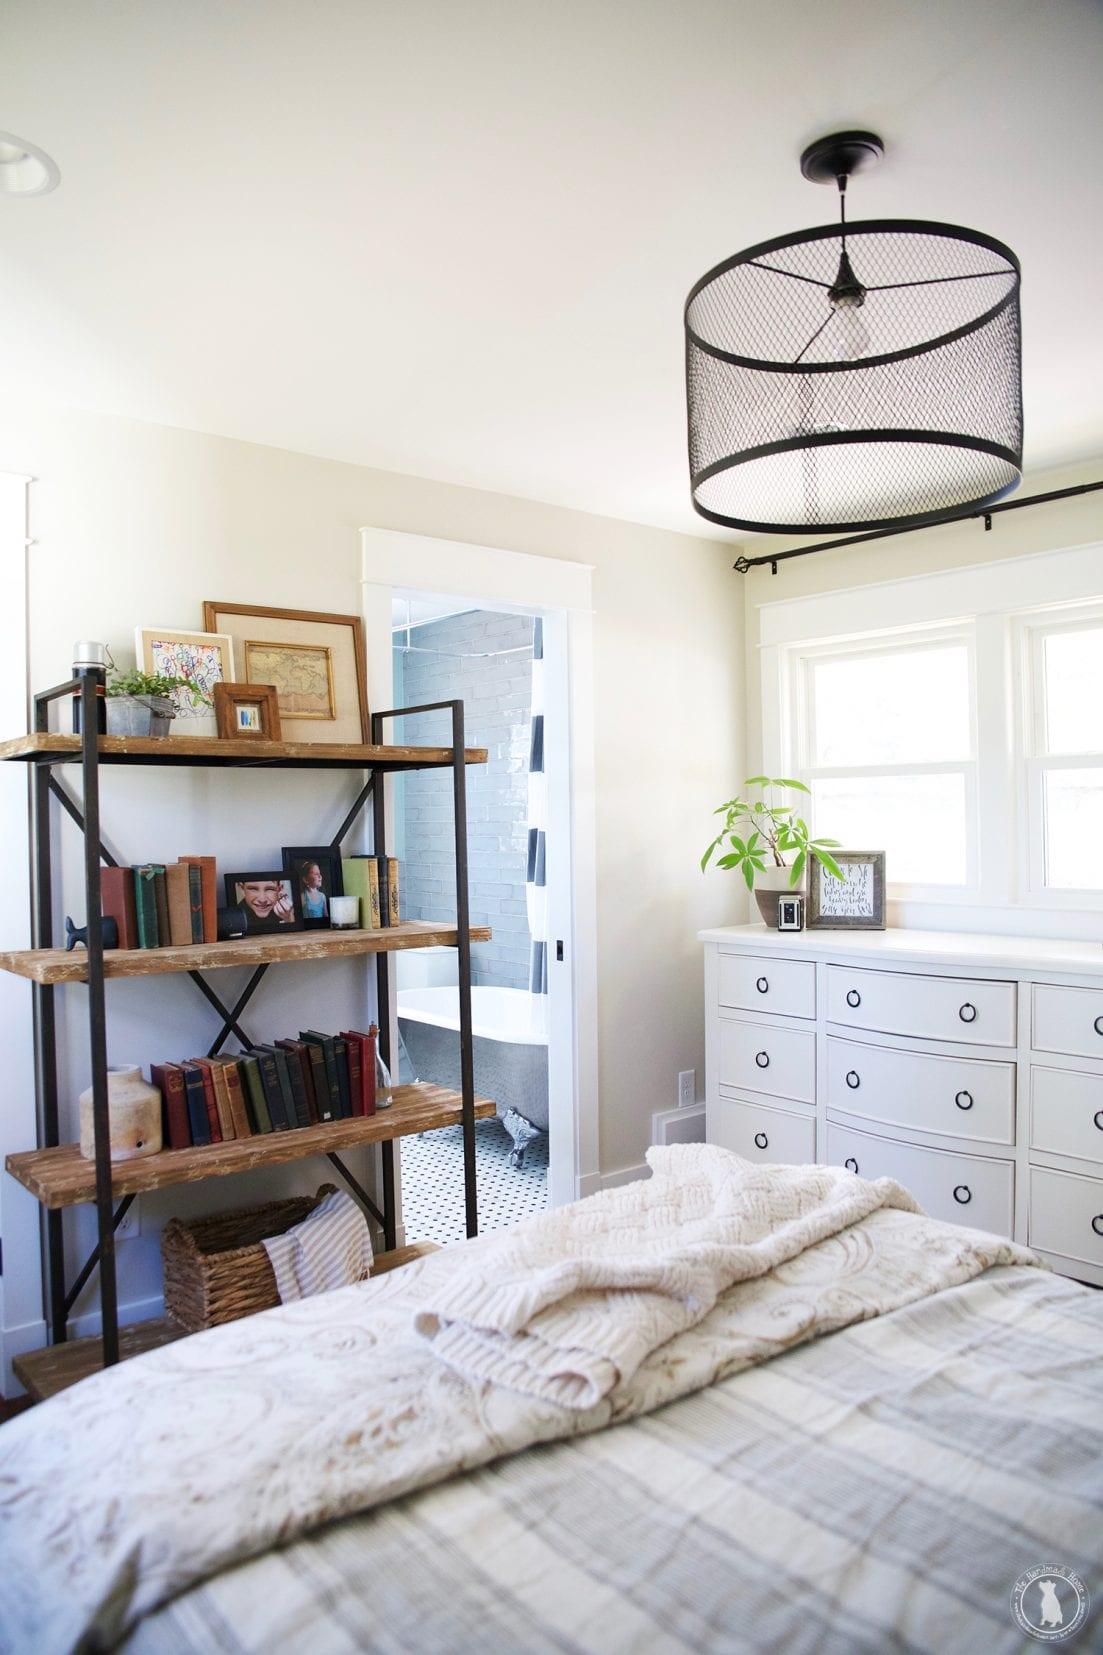 bedroom decorating tips - classic